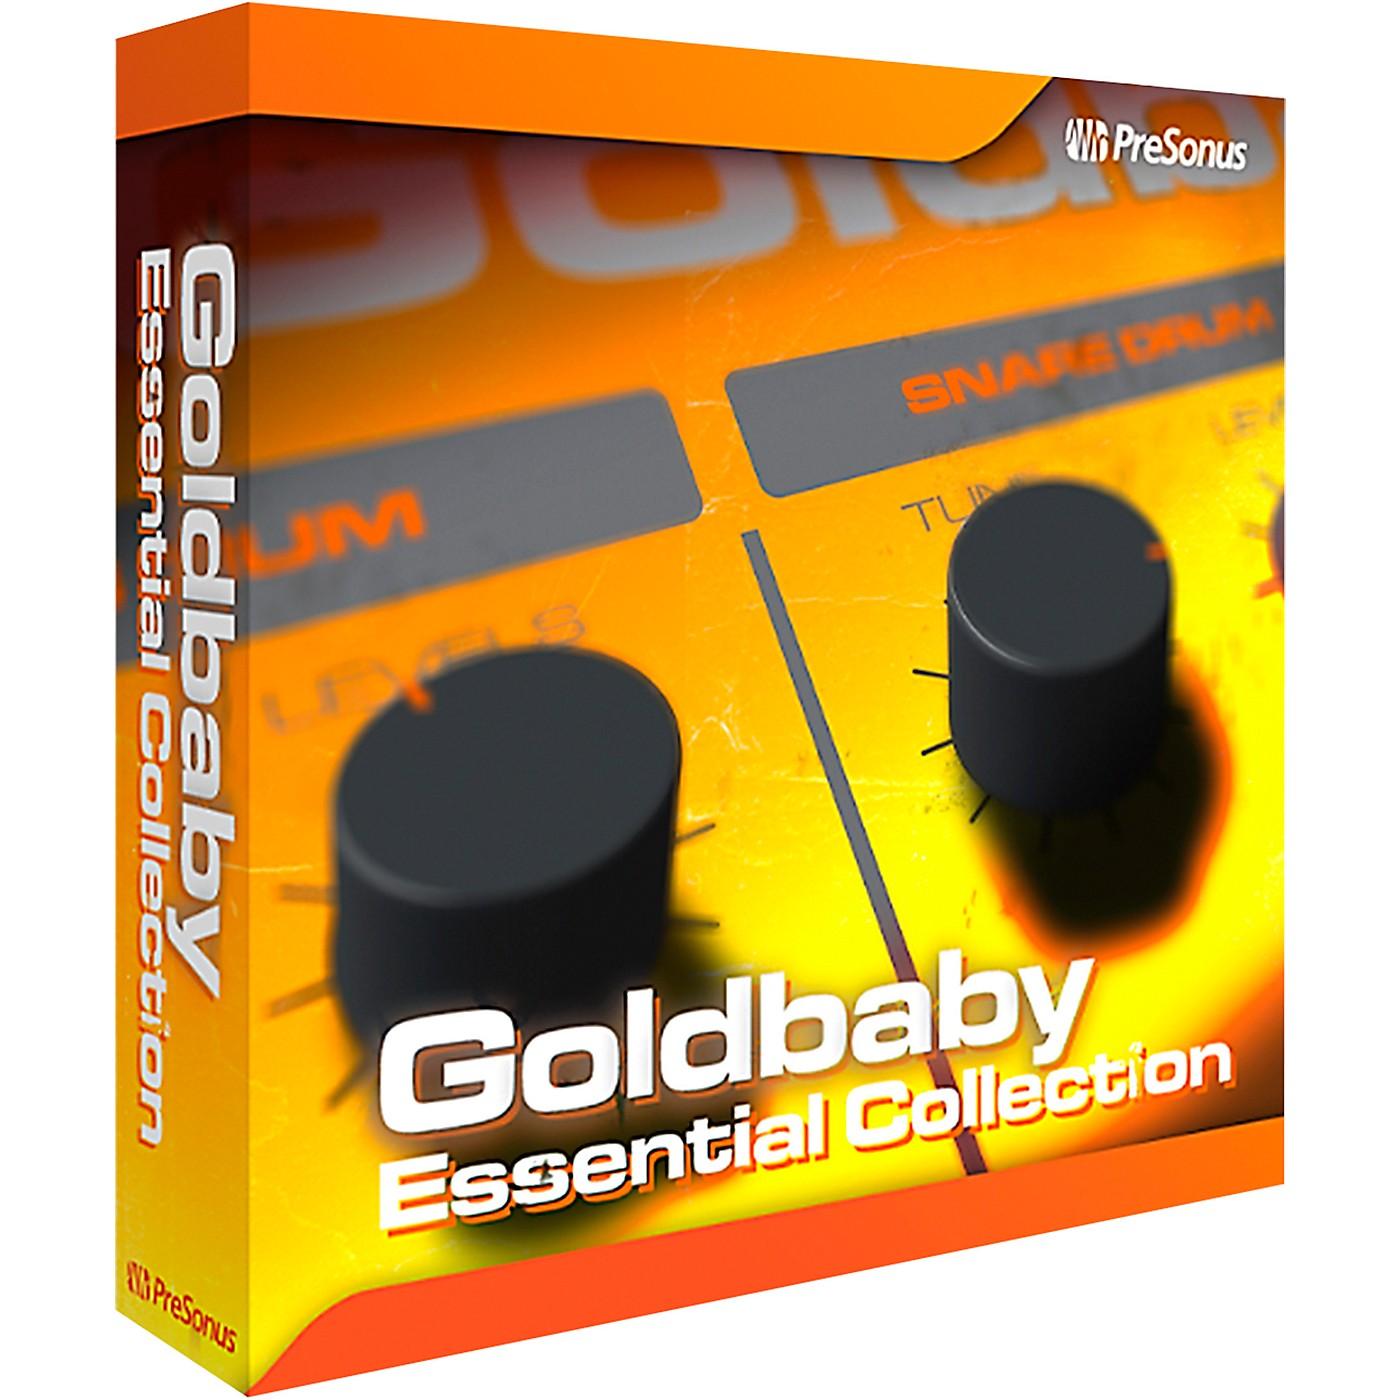 Presonus Goldbaby Essentials Software Download thumbnail